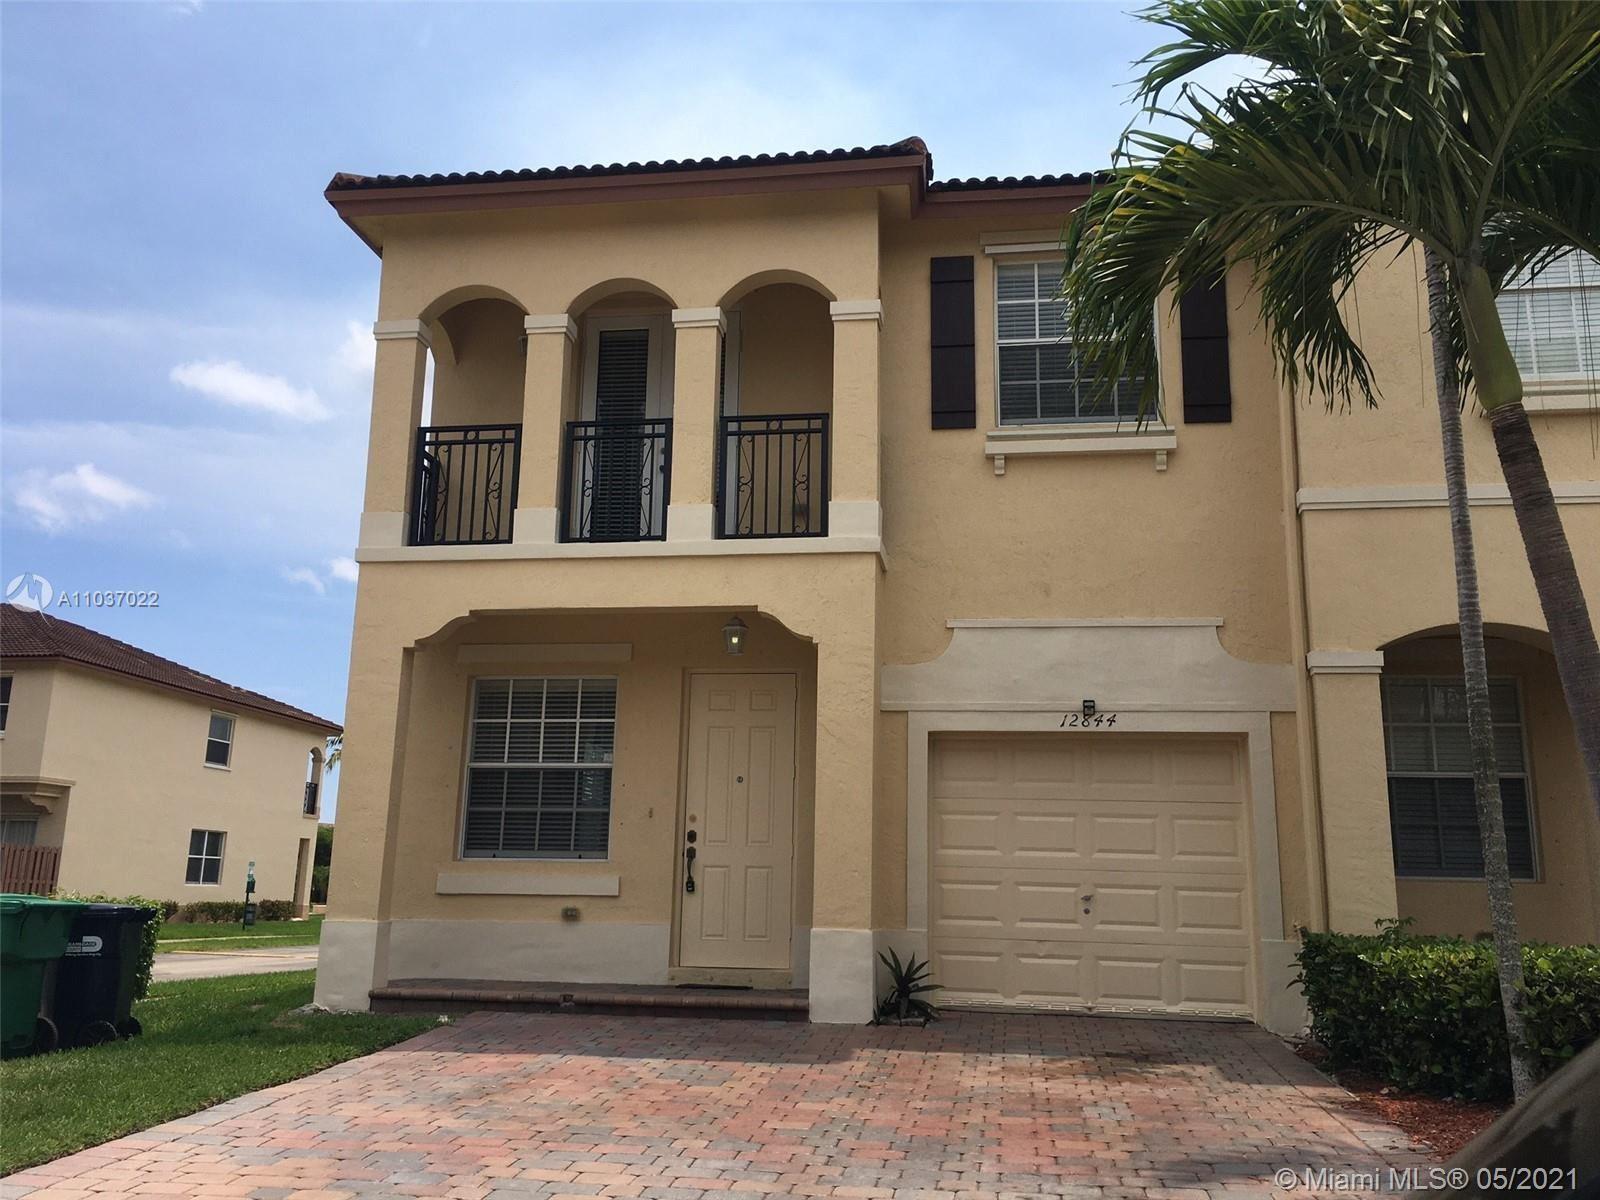 12844 SW 132nd Ter, Miami, FL 33186 - #: A11037022